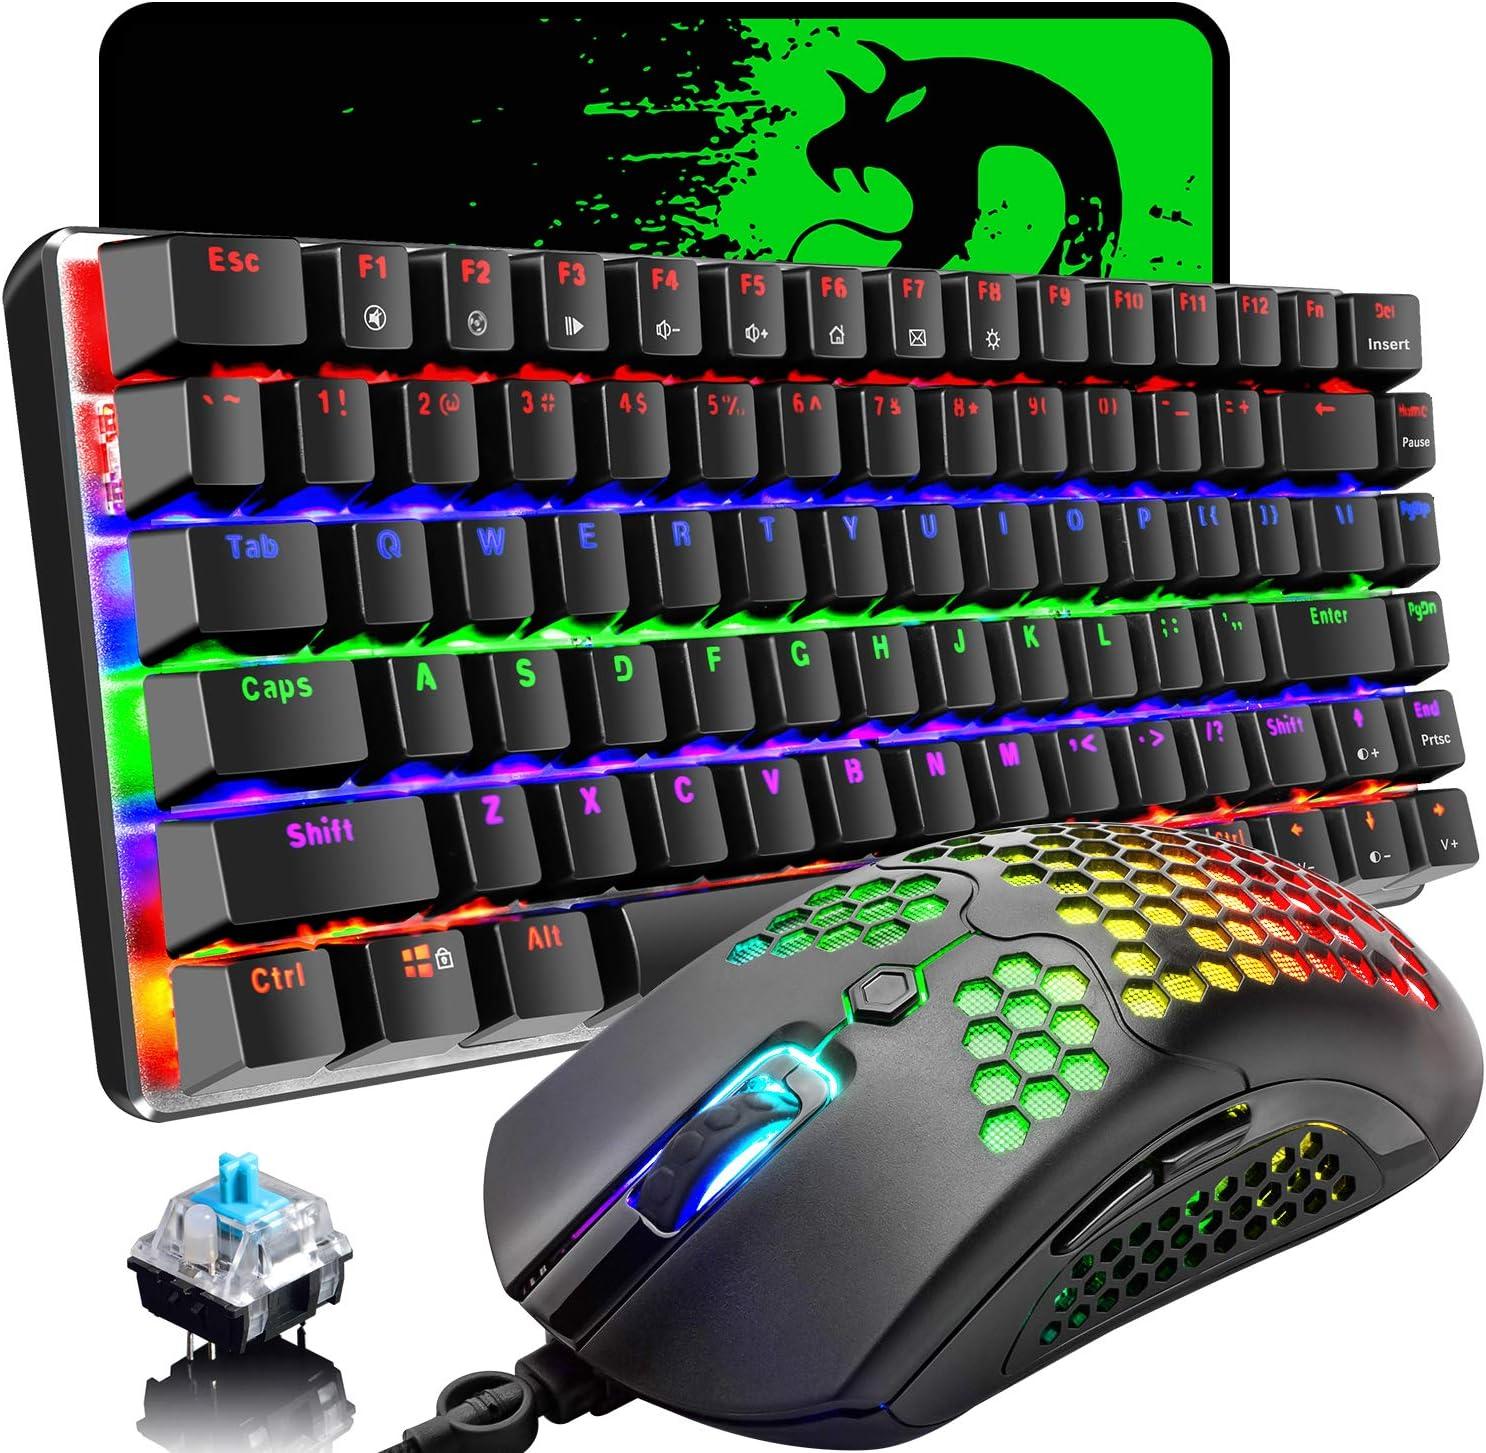 DADUIZHANG Profession Game MechanicalHot Swap Keyboard Gaming Mouse Keyboard Combo Mouse Set /Mouse Keyboard Black